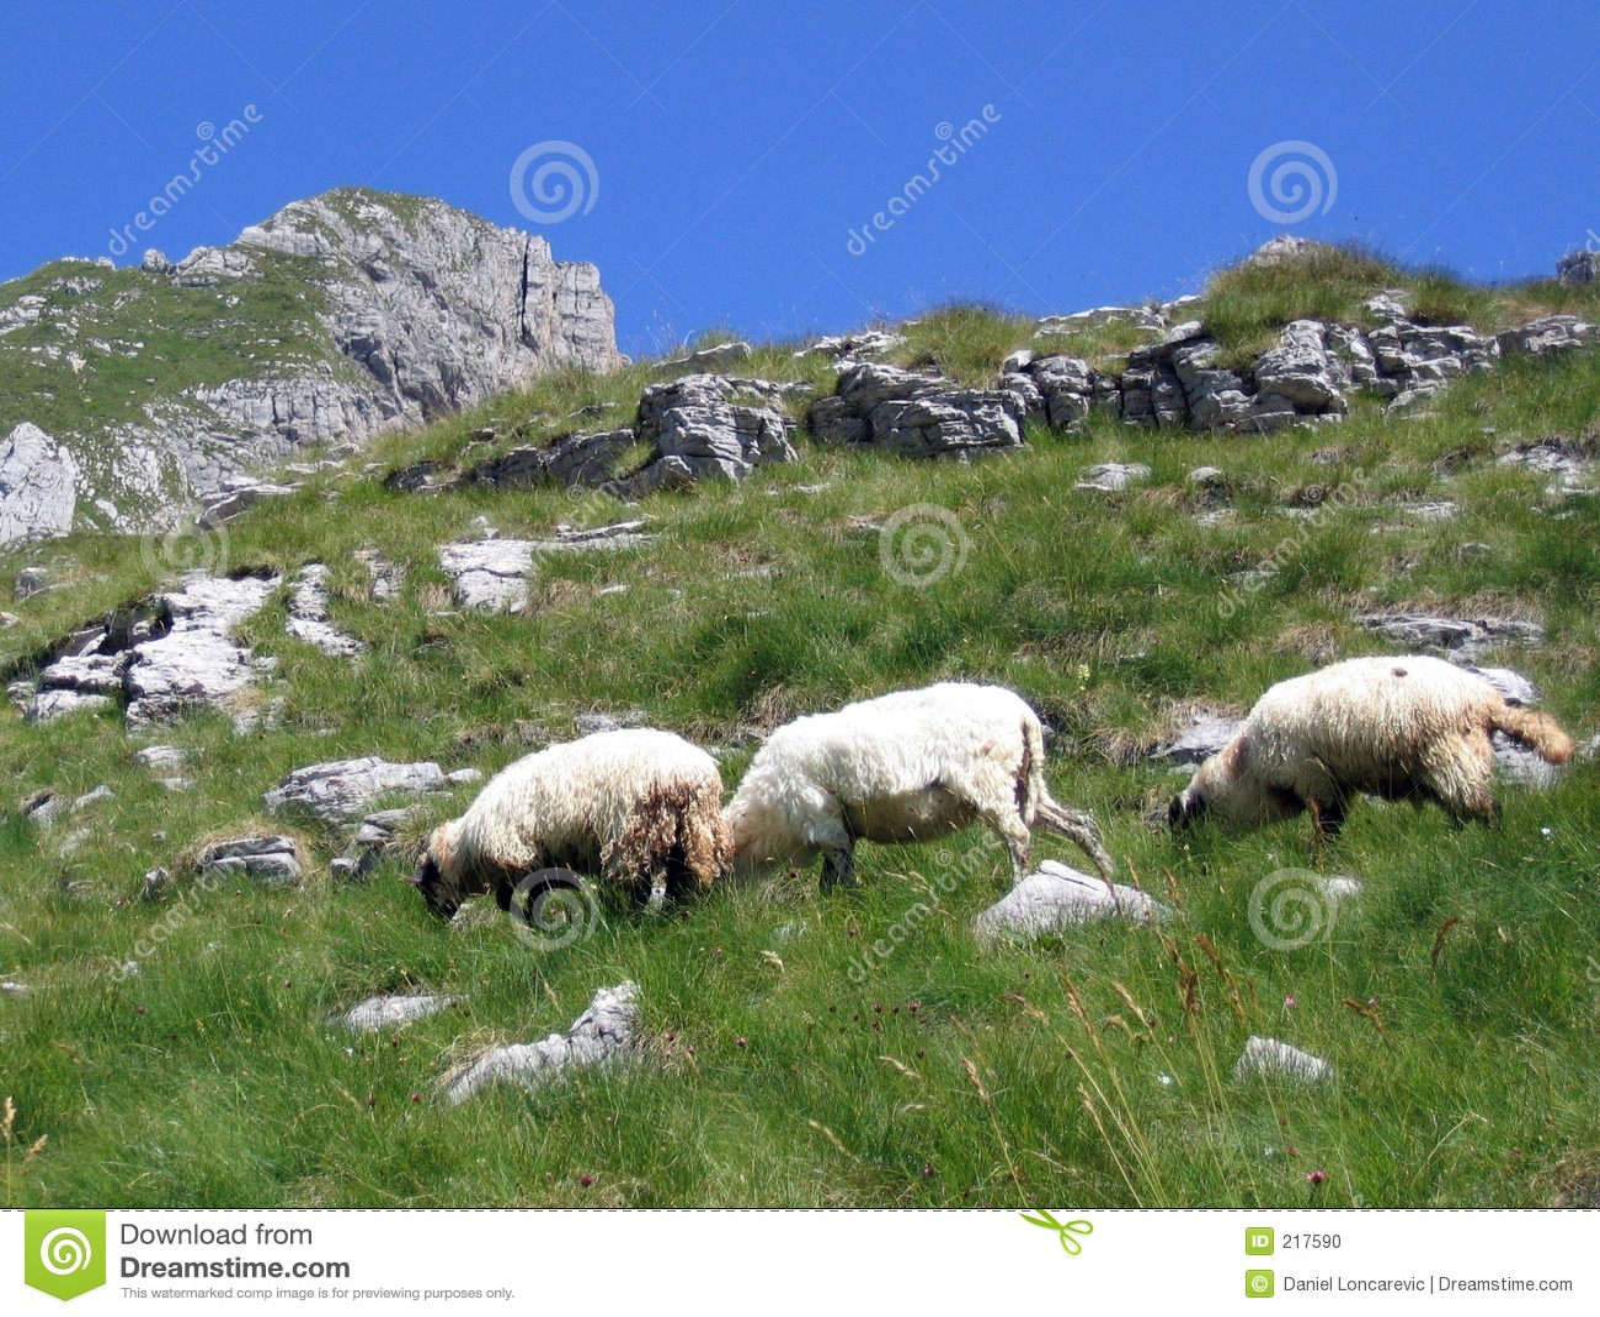 Three sheep - photo#24